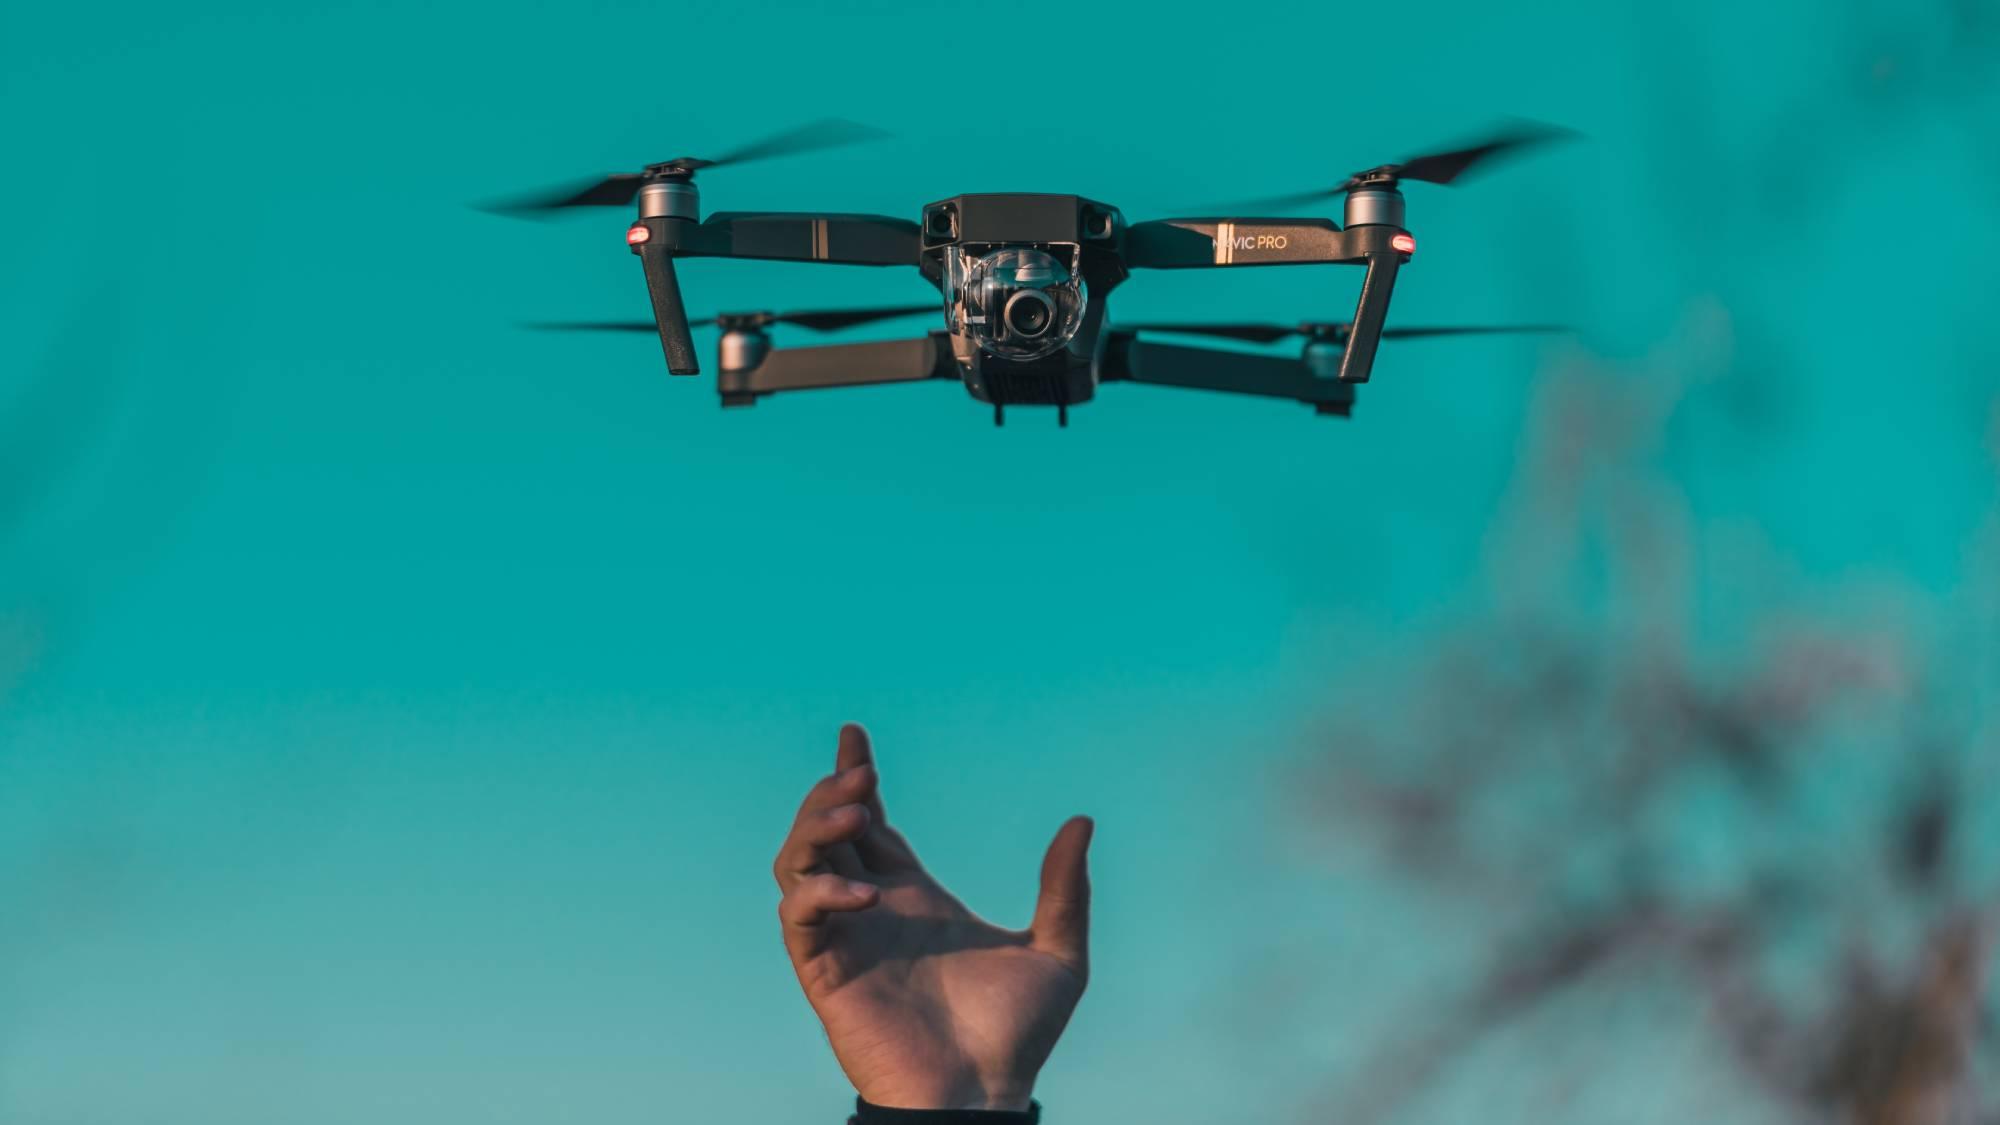 times square nye drone image